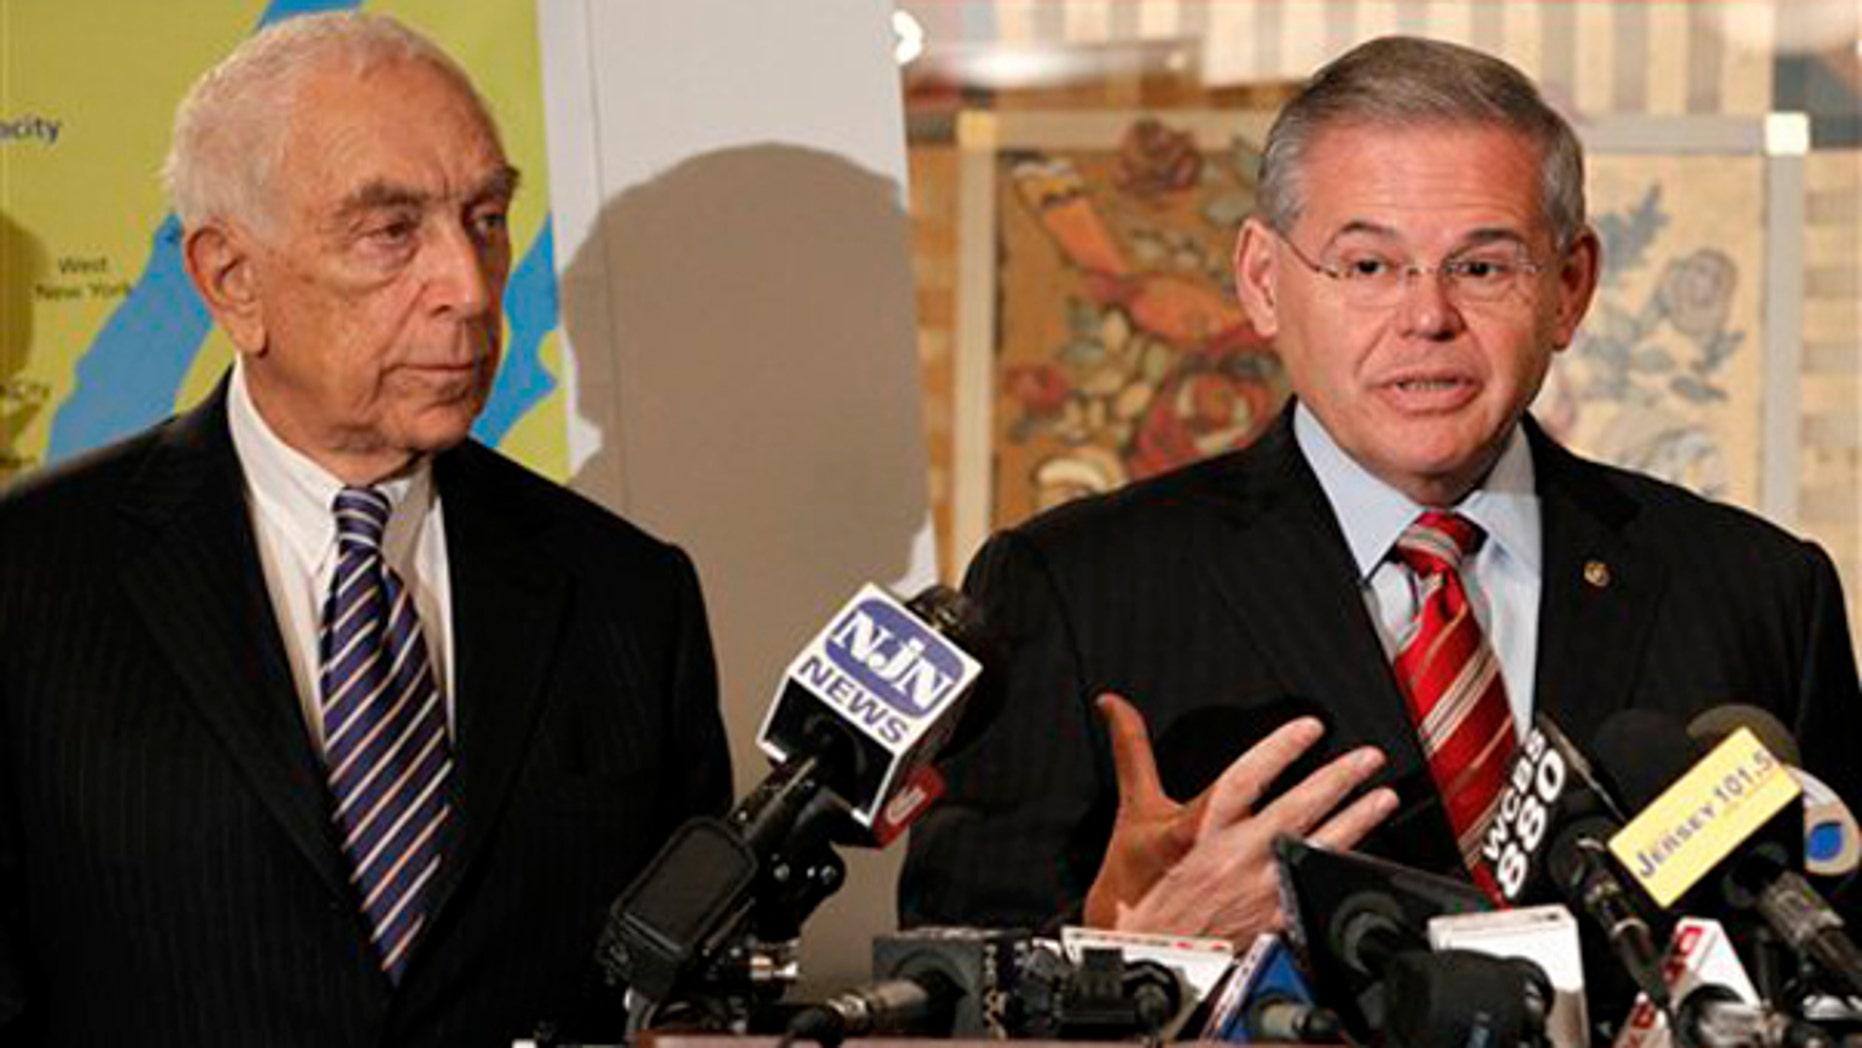 New Jersey Sens. Robert Menendez, right, and Sen. Frank R. Lautenberg.